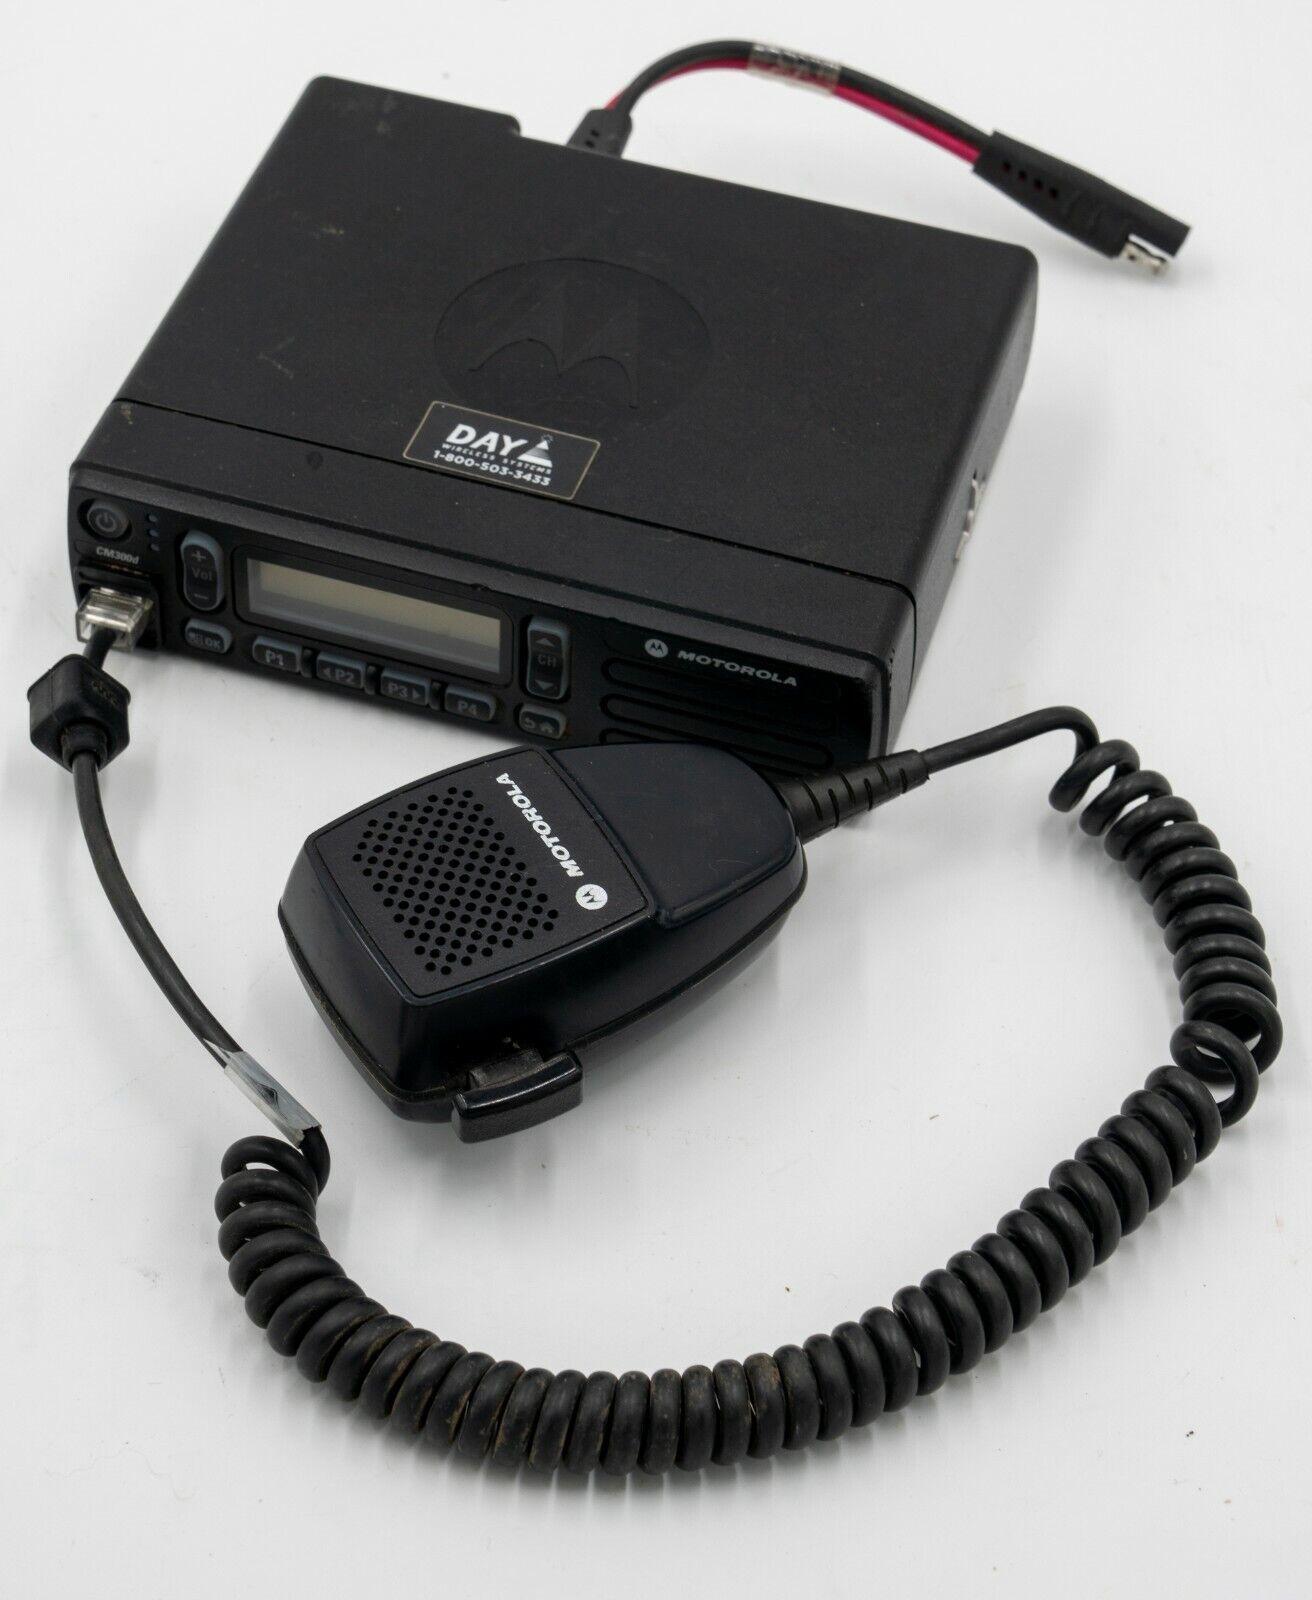 Motorola CM300D UHF Mobile Radio & Antenna. Buy it now for 249.99